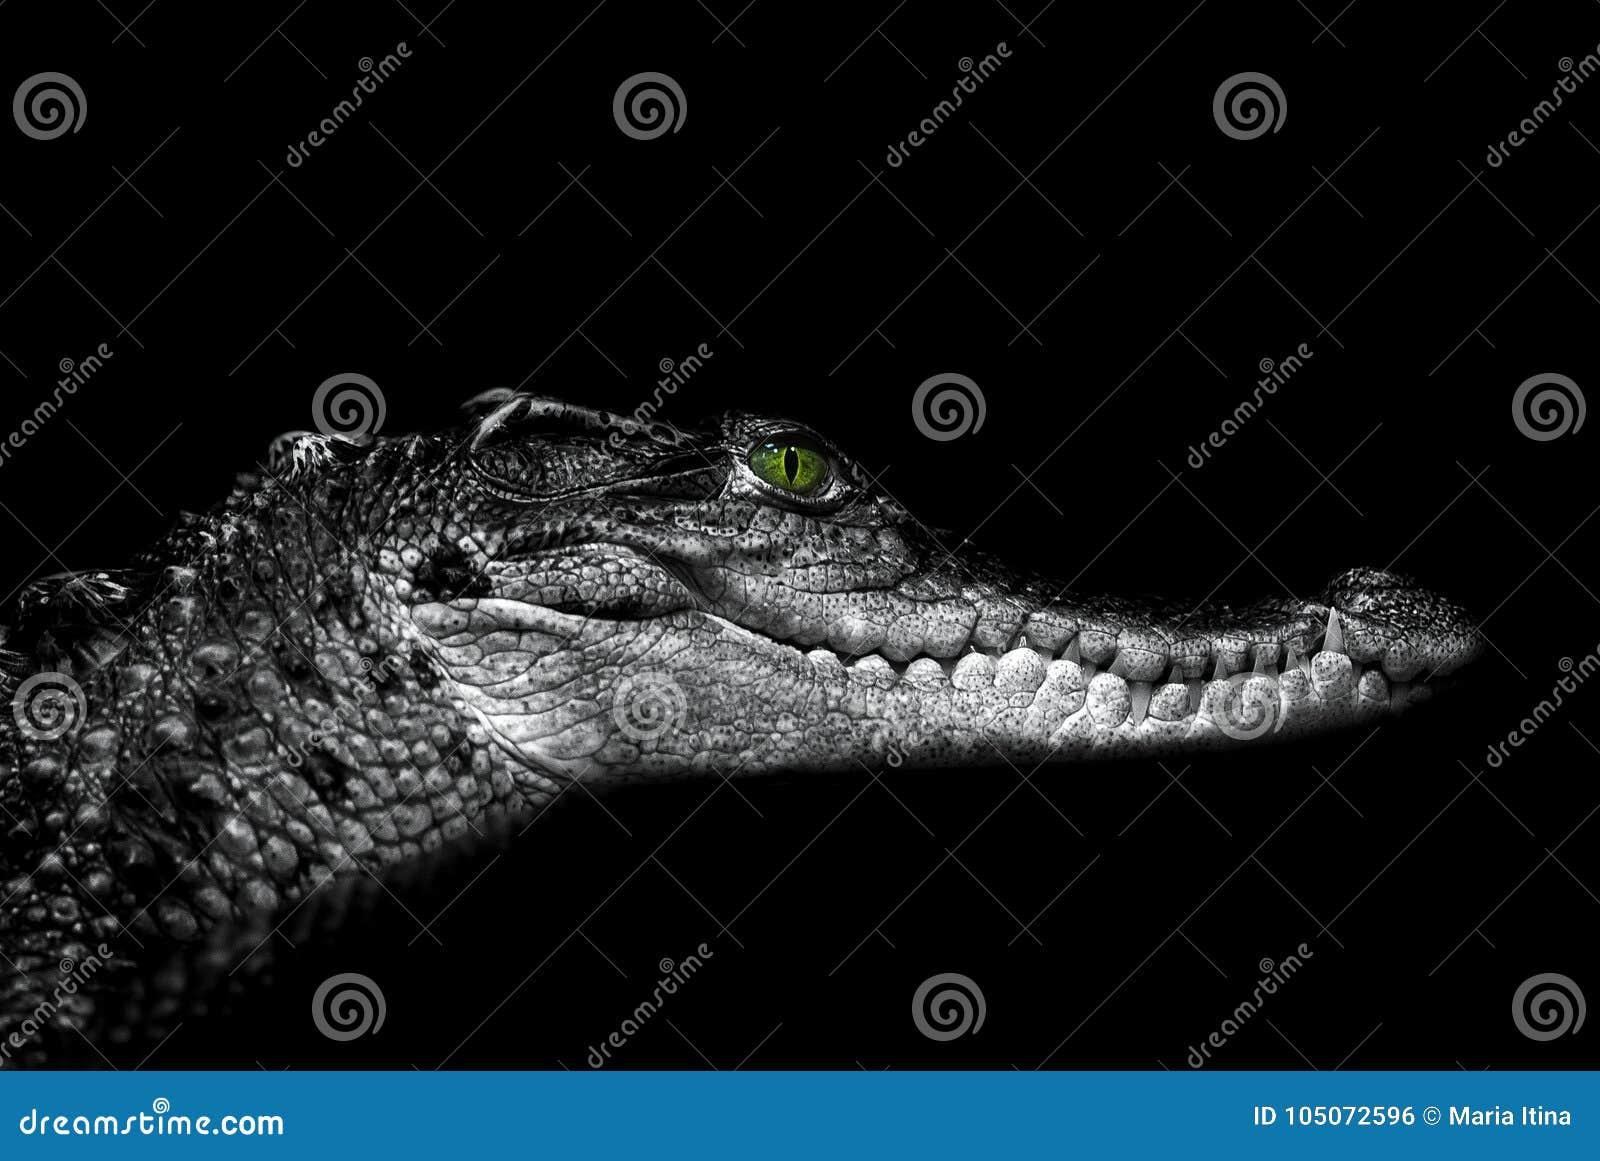 Crocodile: portrait on a black